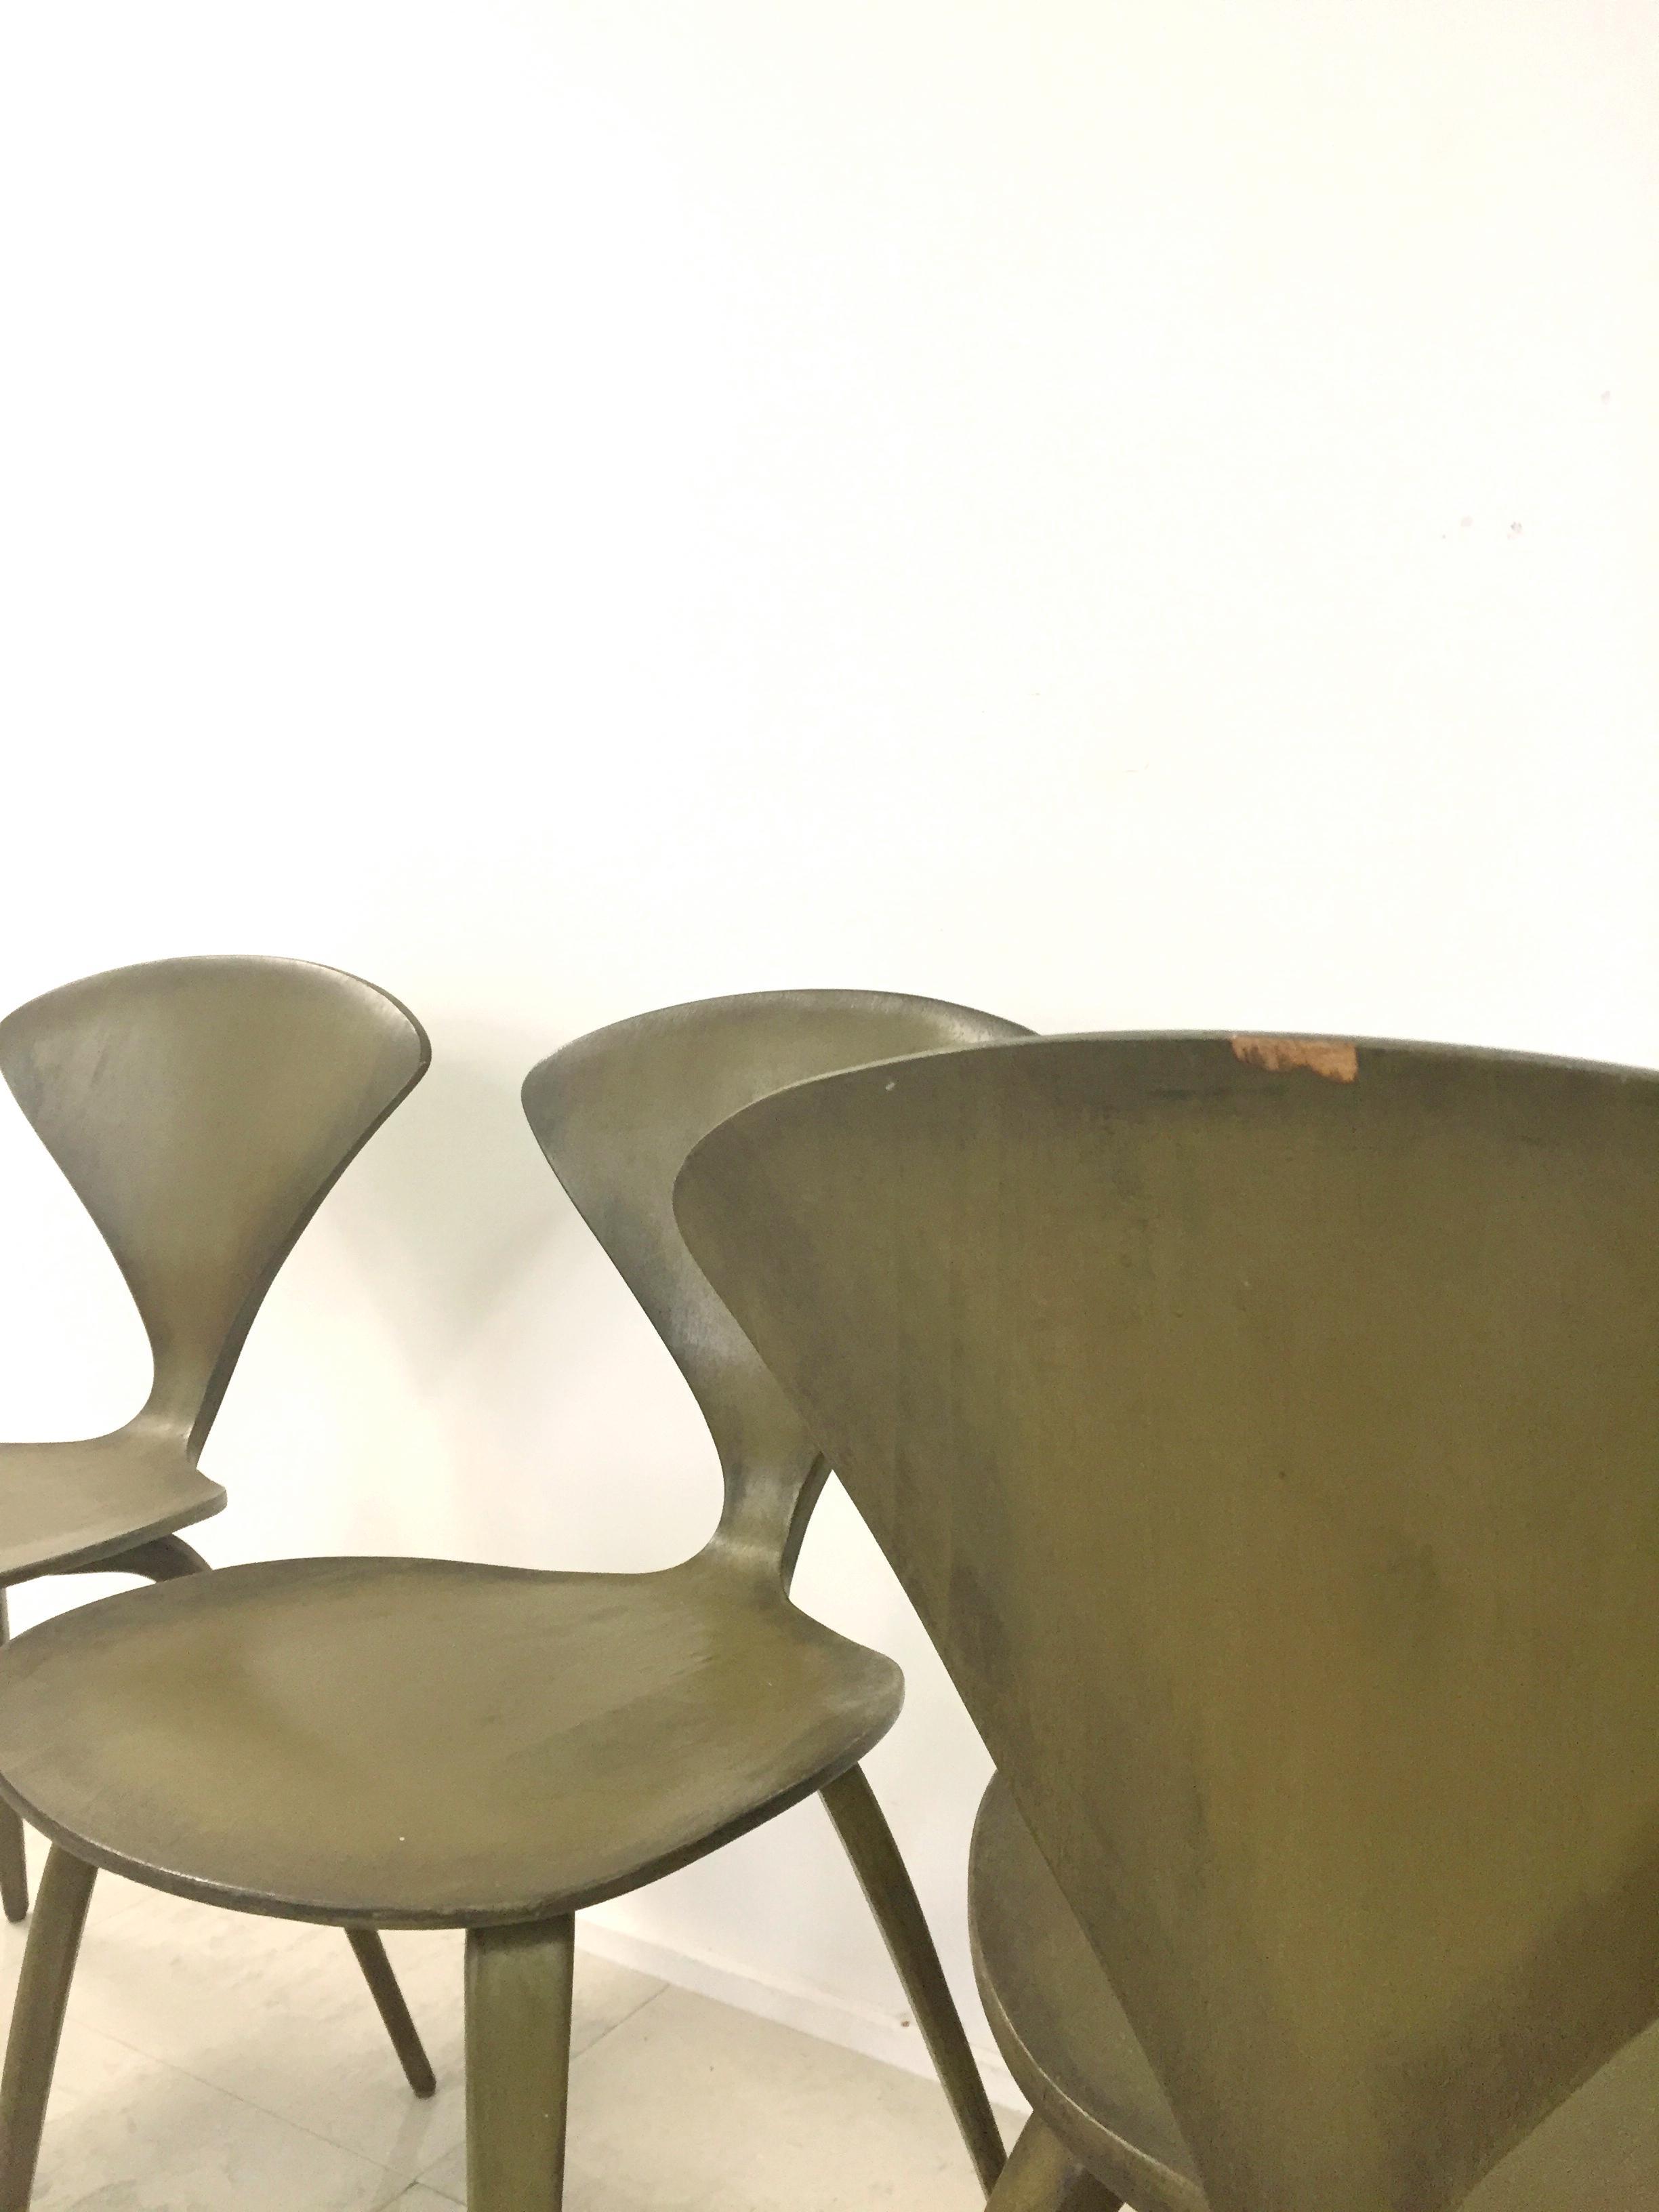 norman cherner for plycraft vintage chairs set 4 image 10 of 10